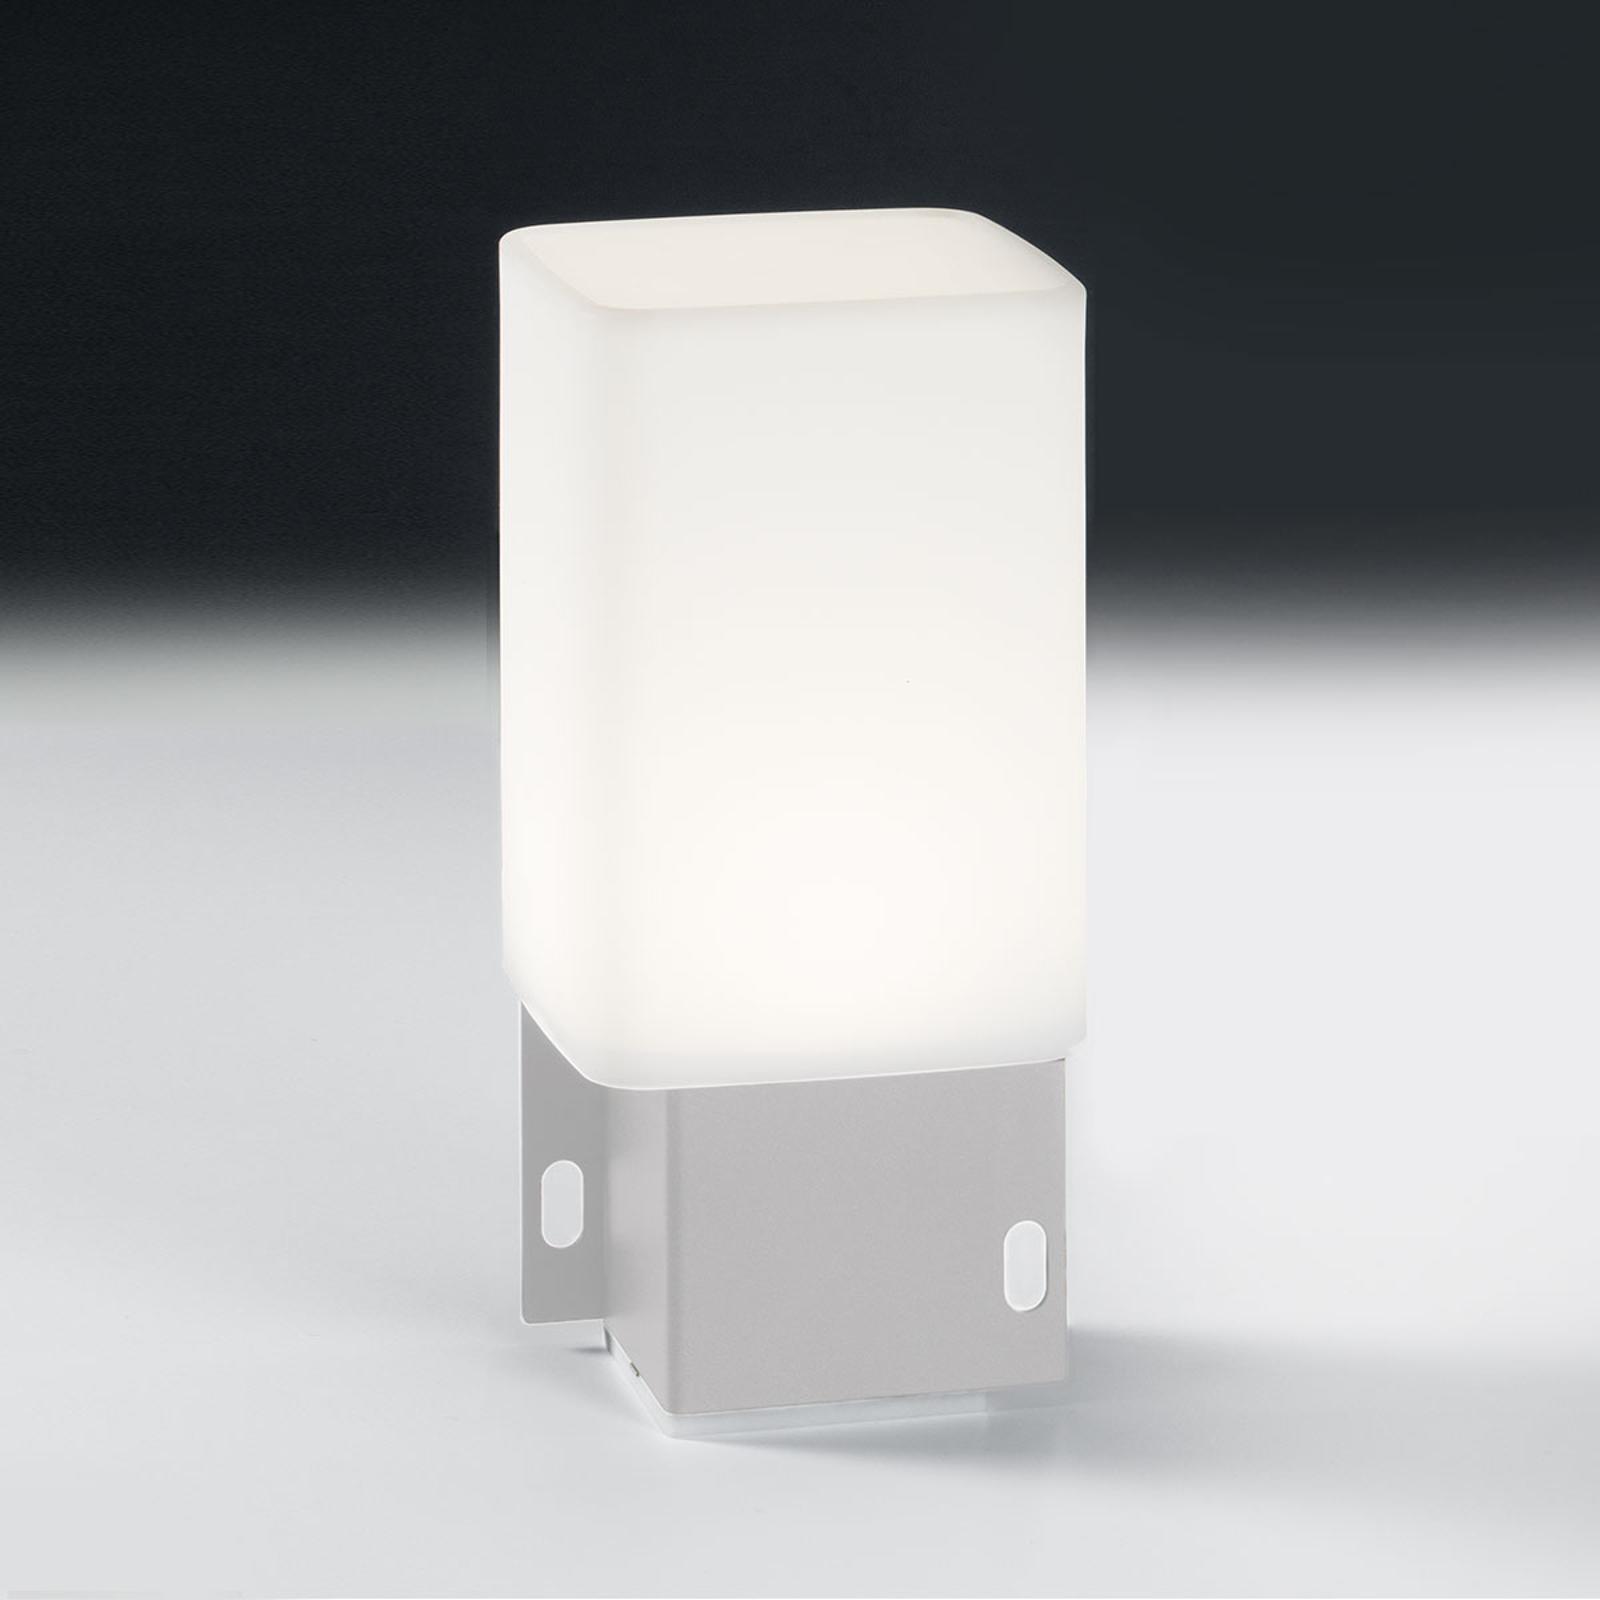 LED-Außendekolampe Cuadrat - 6-fach-USB, weiß